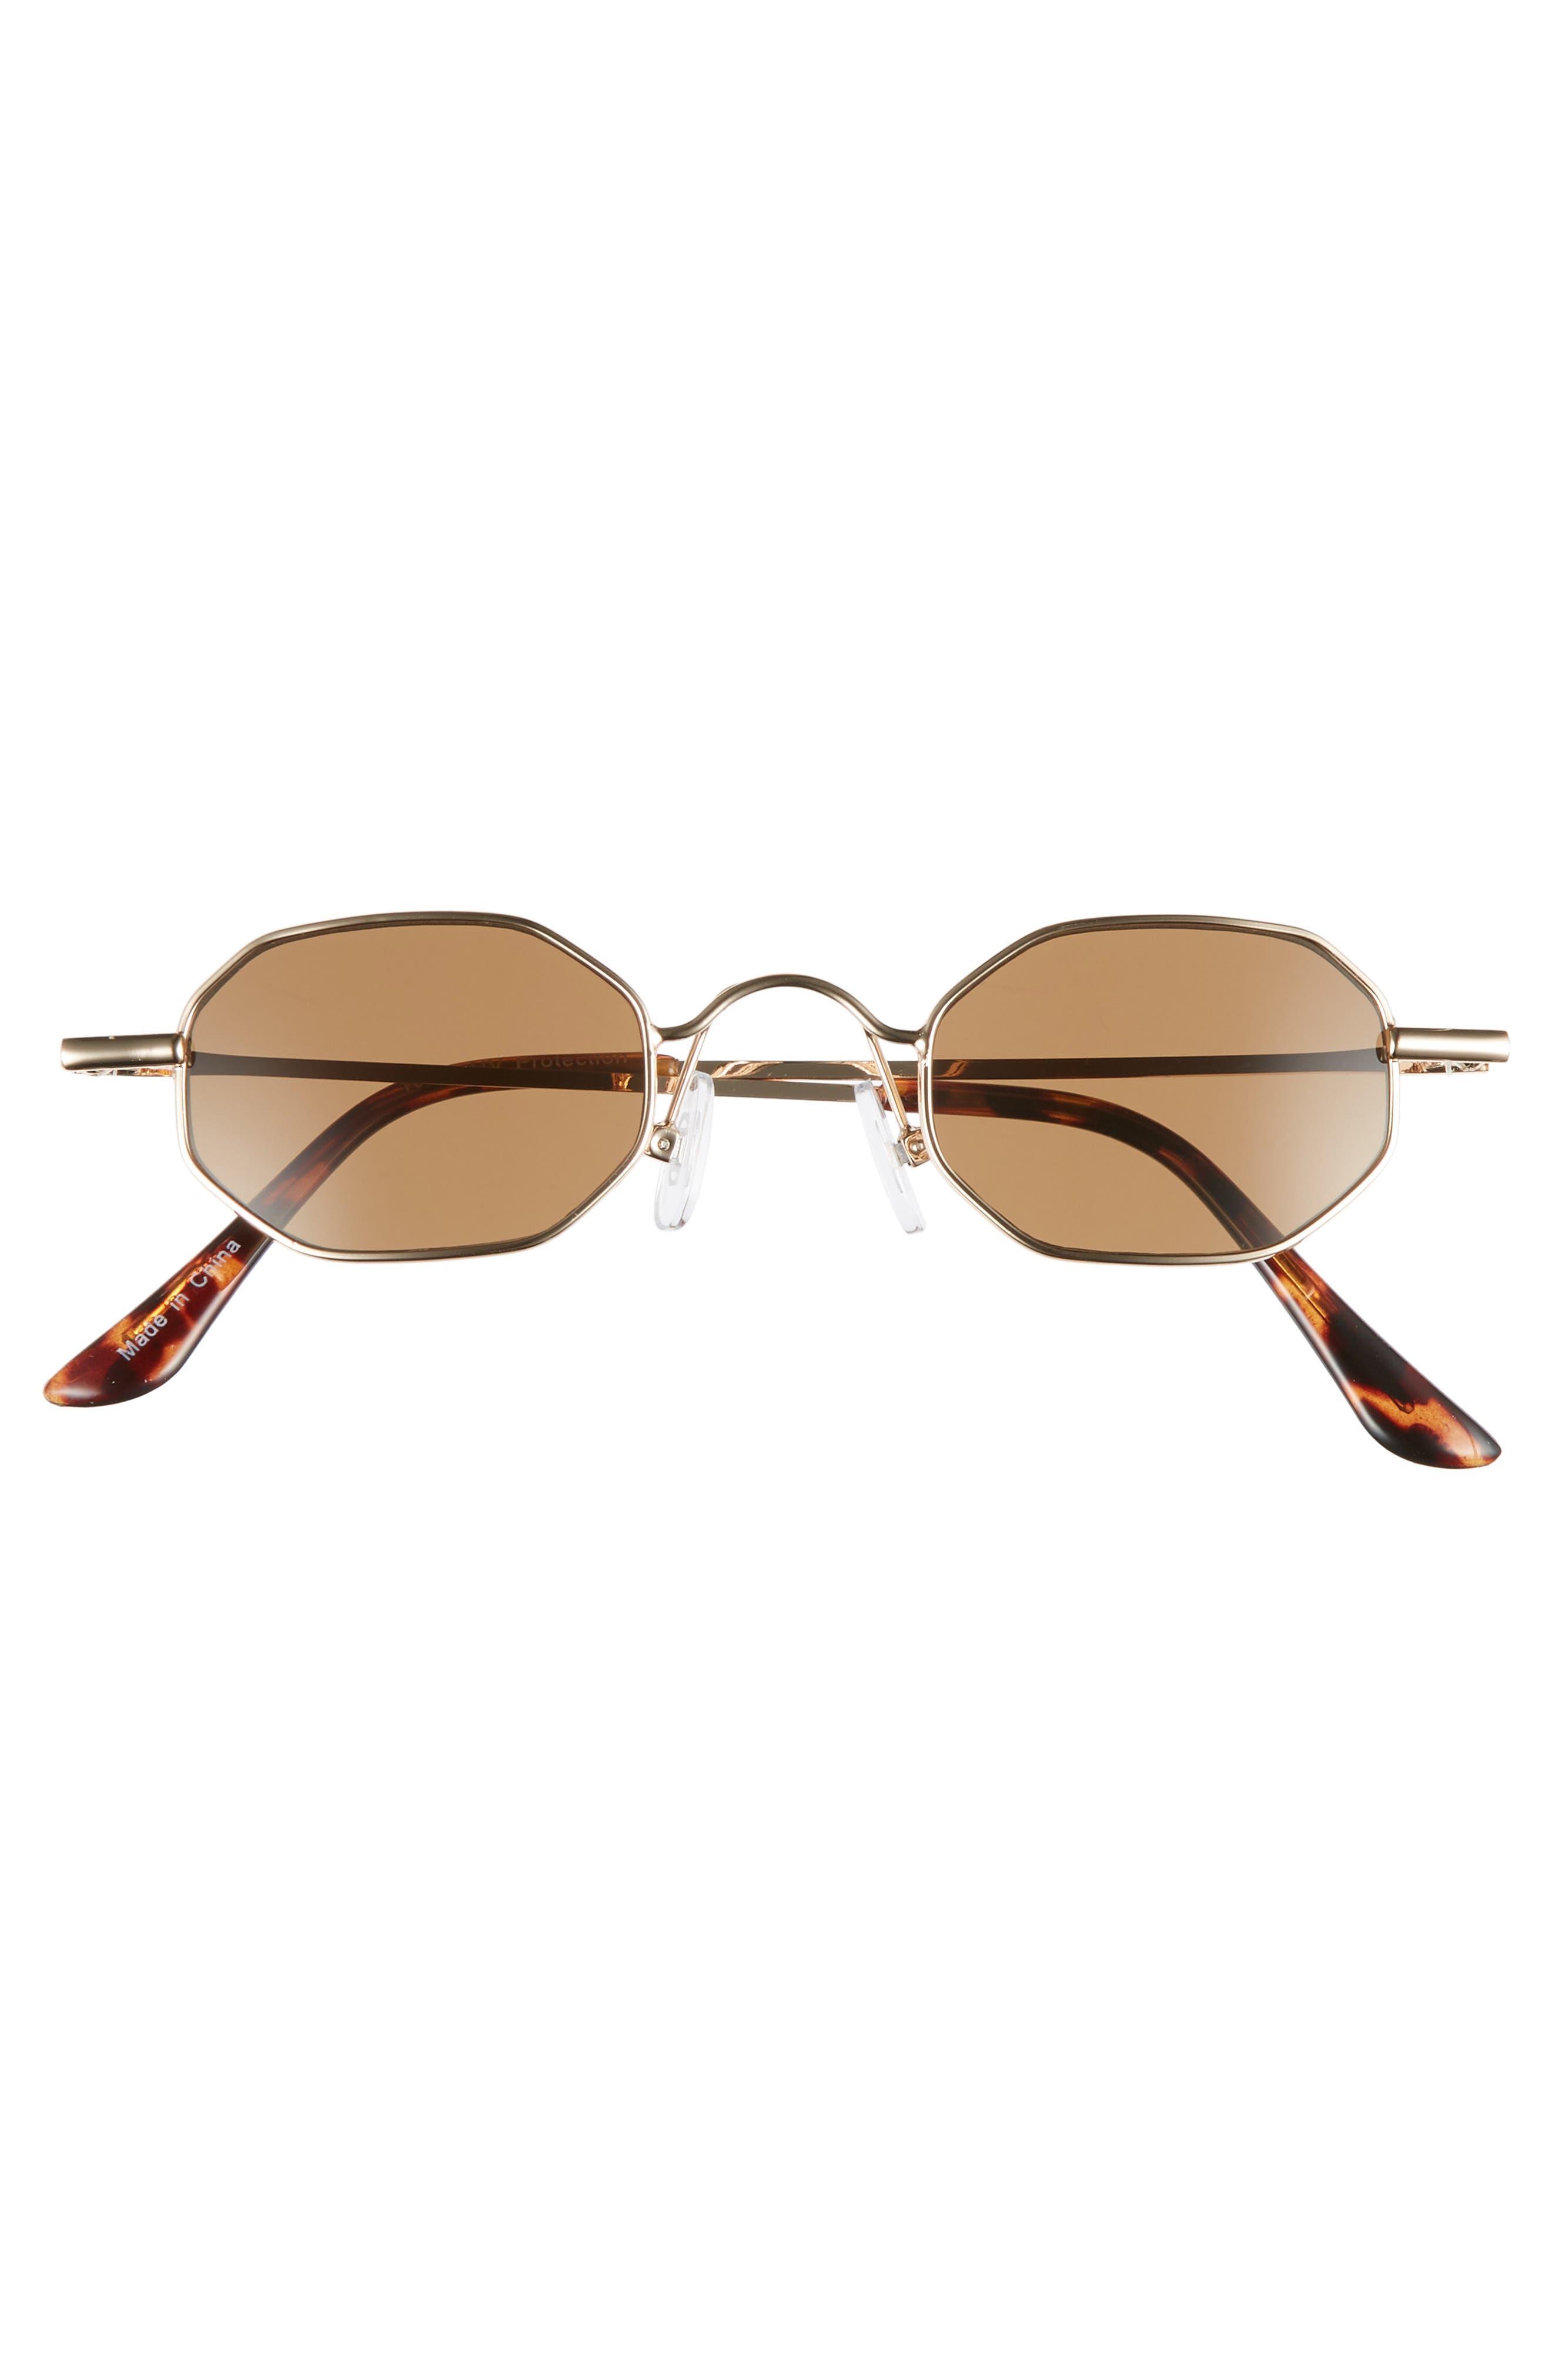 40mm Mini Hexagon Sunglasses,                             Alternate thumbnail 3, color,                             BROWN GOLD